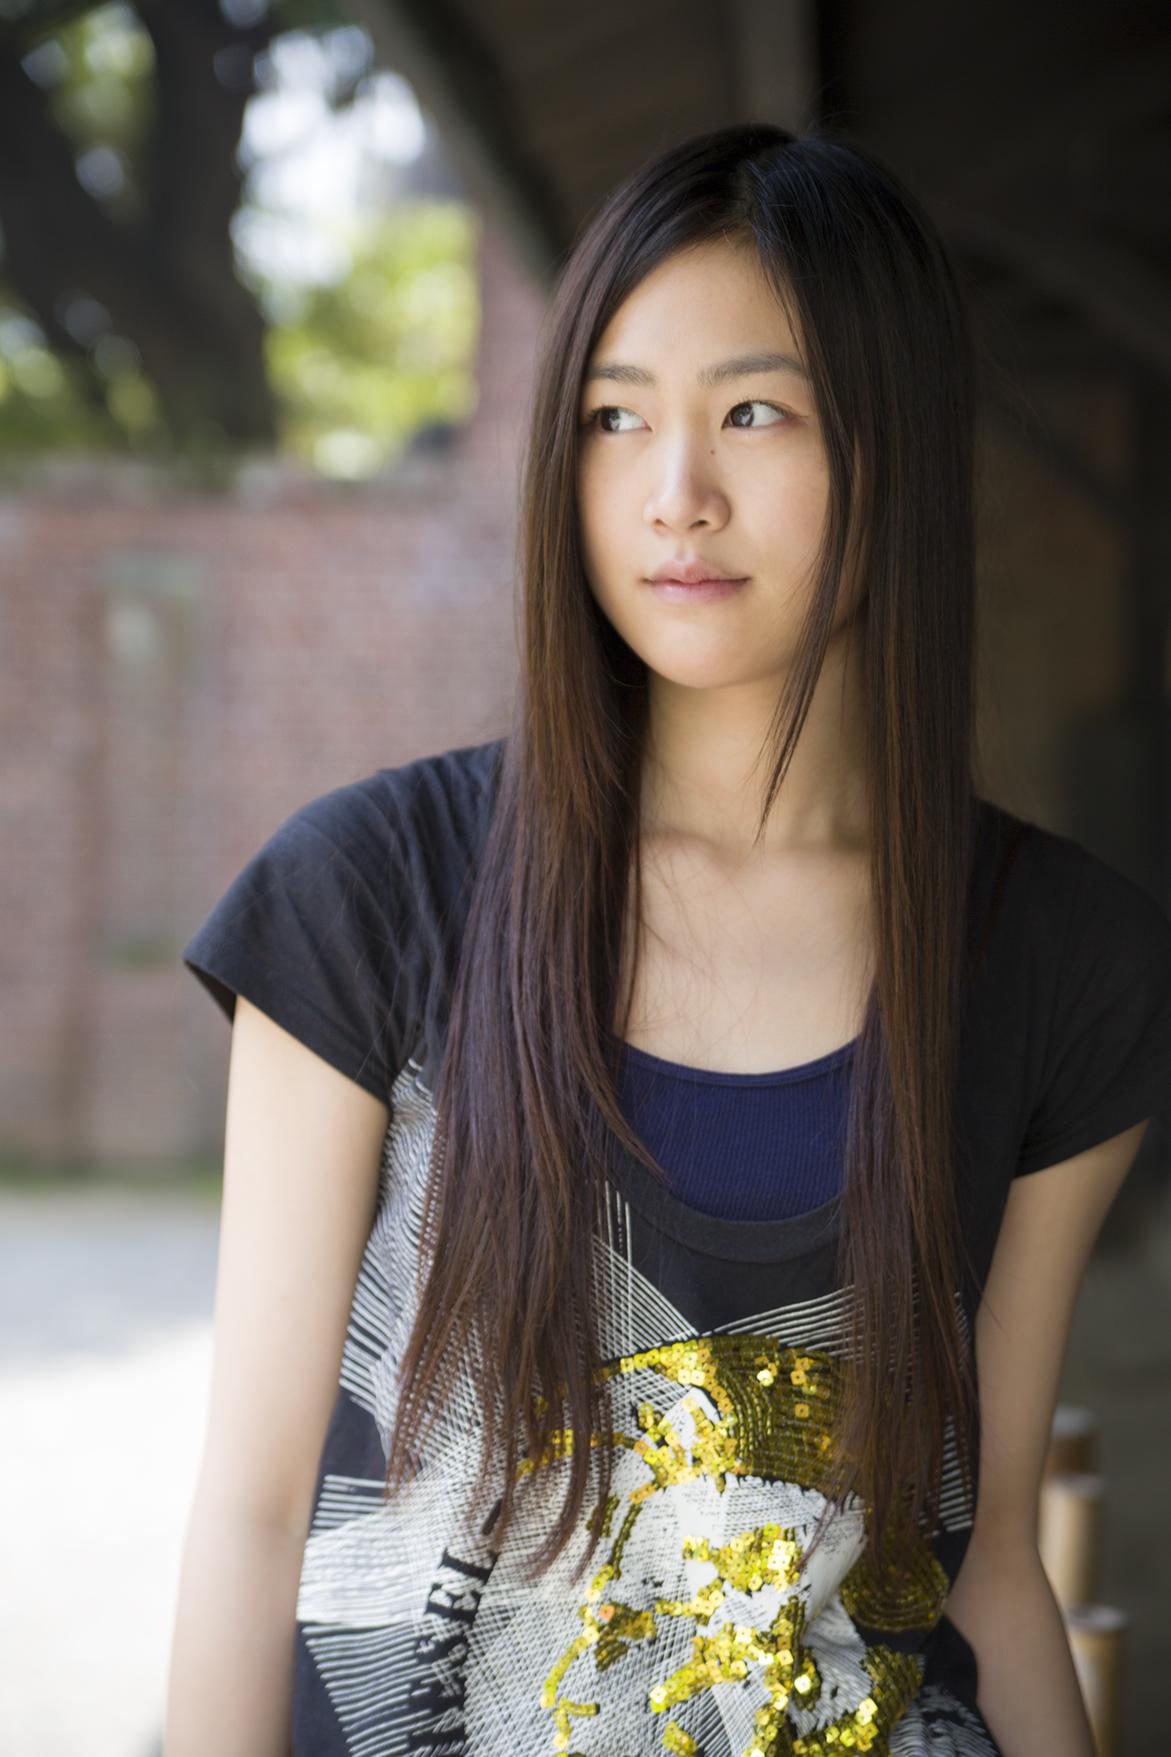 "NAVER まとめ""モデル級の小顔で美形 しかも透明感バツグン"" 女優 小篠恵奈"